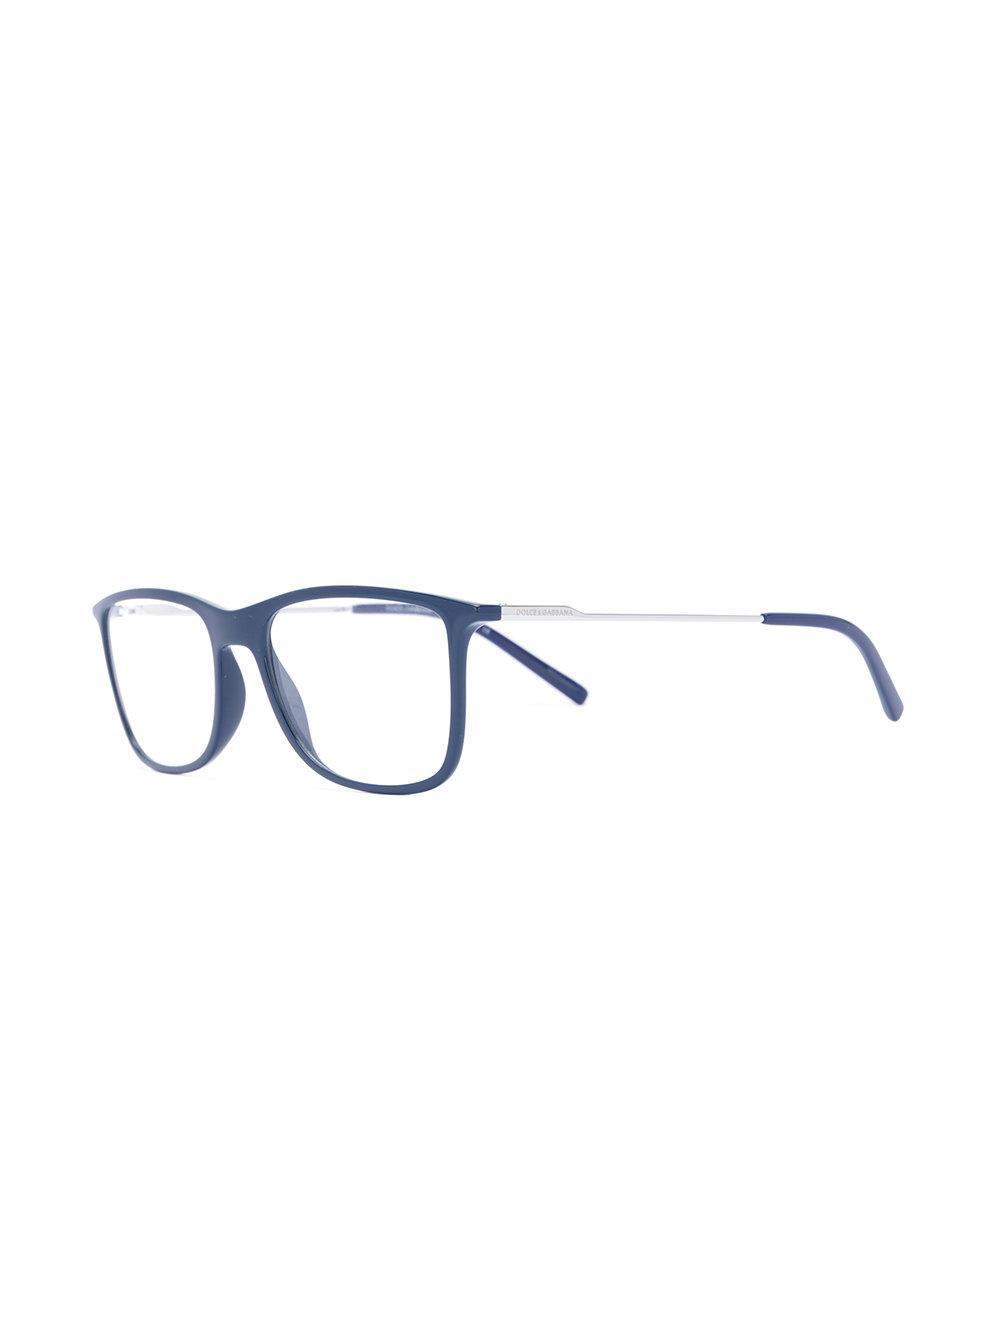 1bdcc3282b20 Dolce   Gabbana Square-frame Glasses in Blue - Lyst